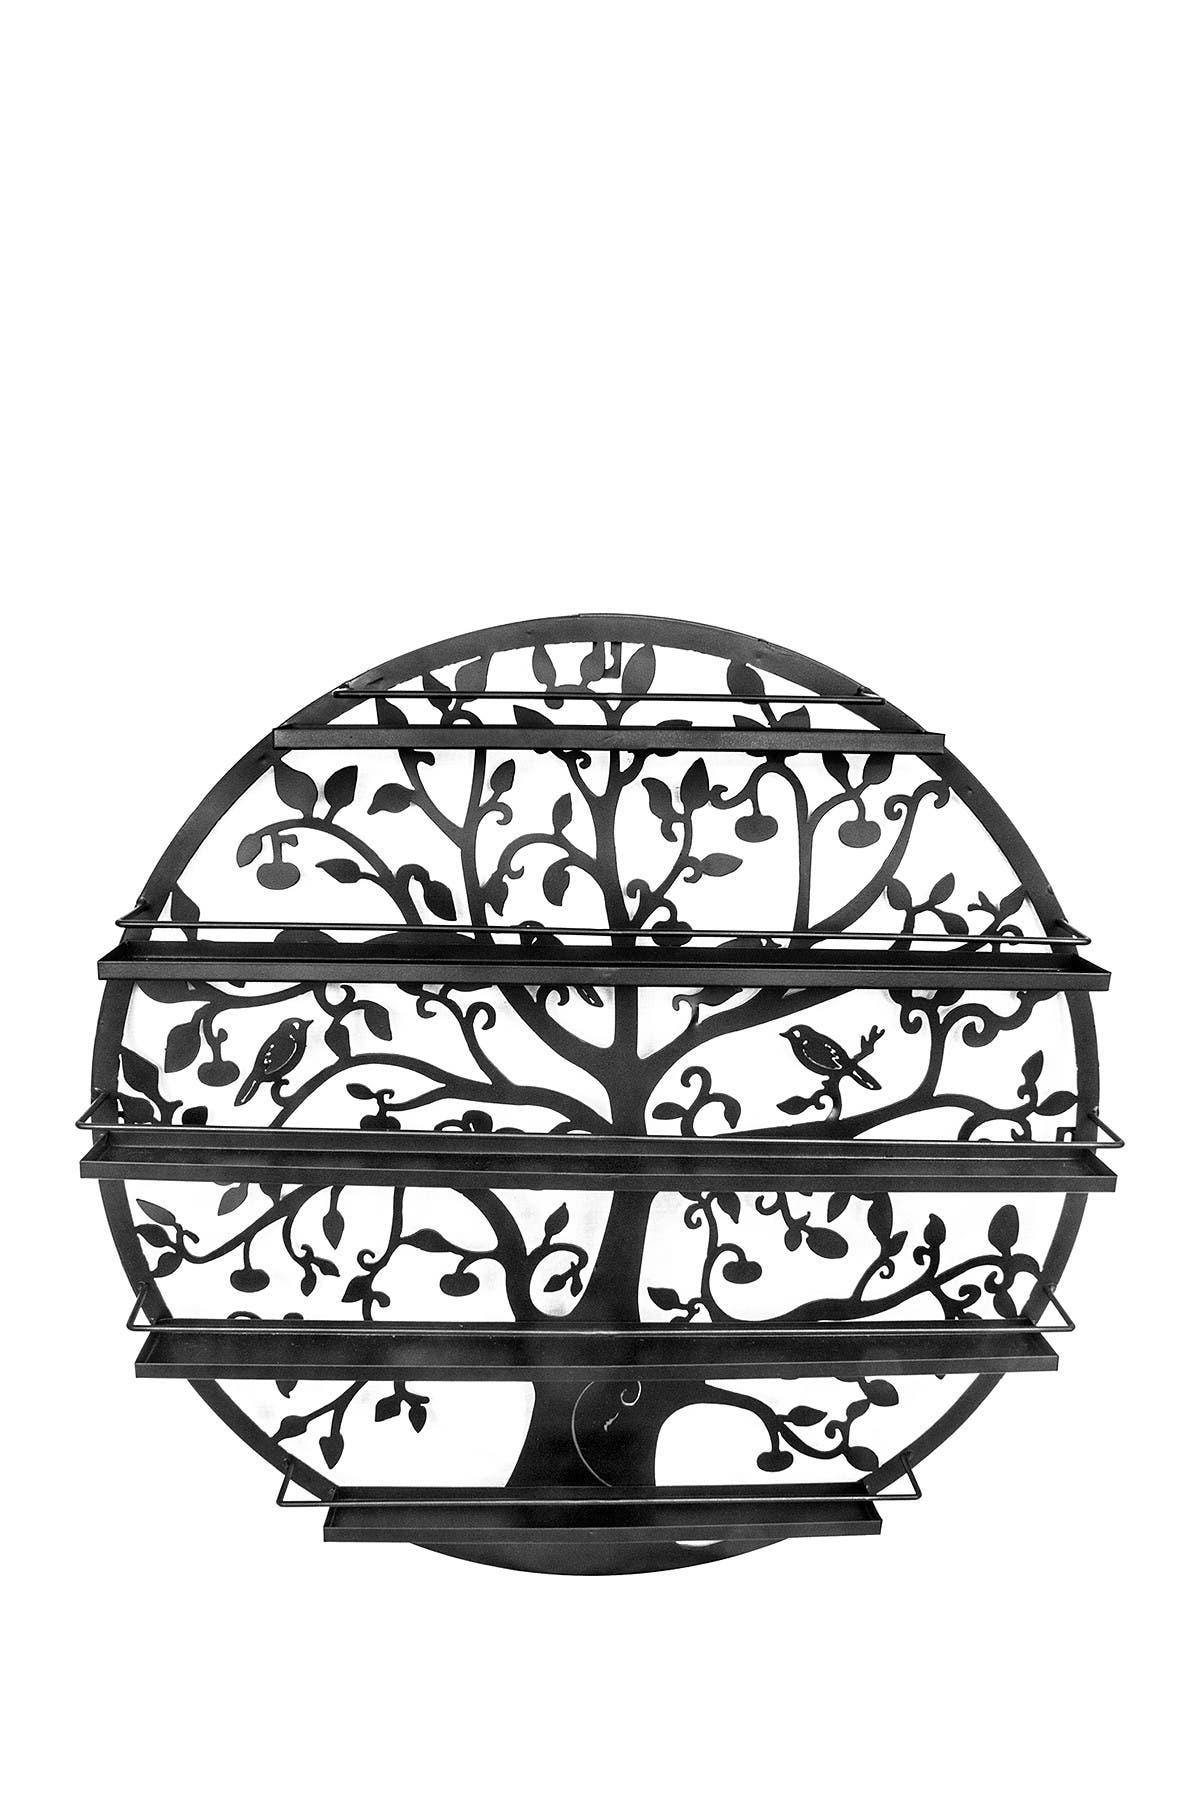 Image of Sorbus Black Tree Silhouette Round Metal Wall Mounted 5 Tier Salon Nail Polish Rack Holder/Wall Art Display